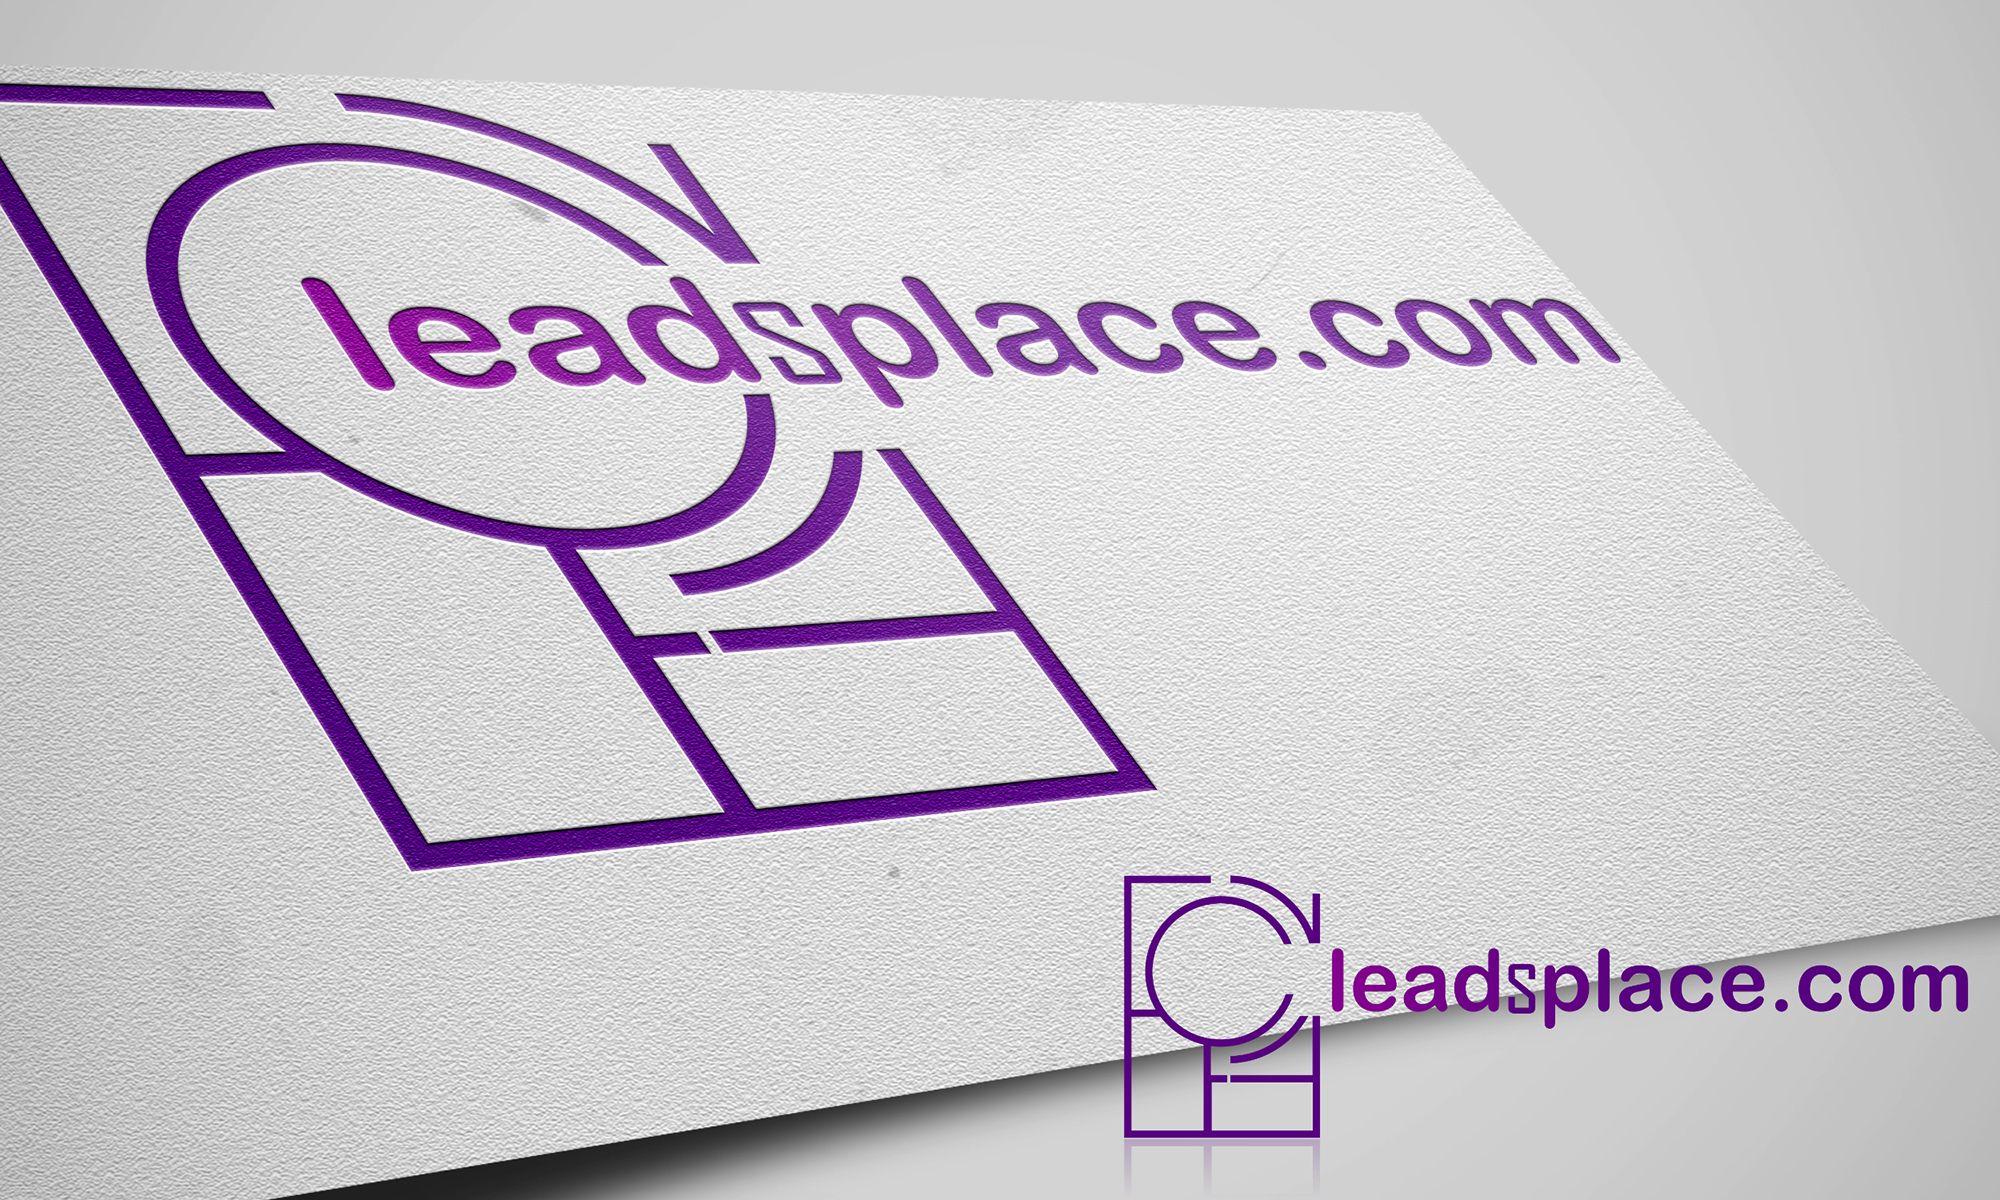 leadsplace.com - логотип - дизайнер GQmyteam